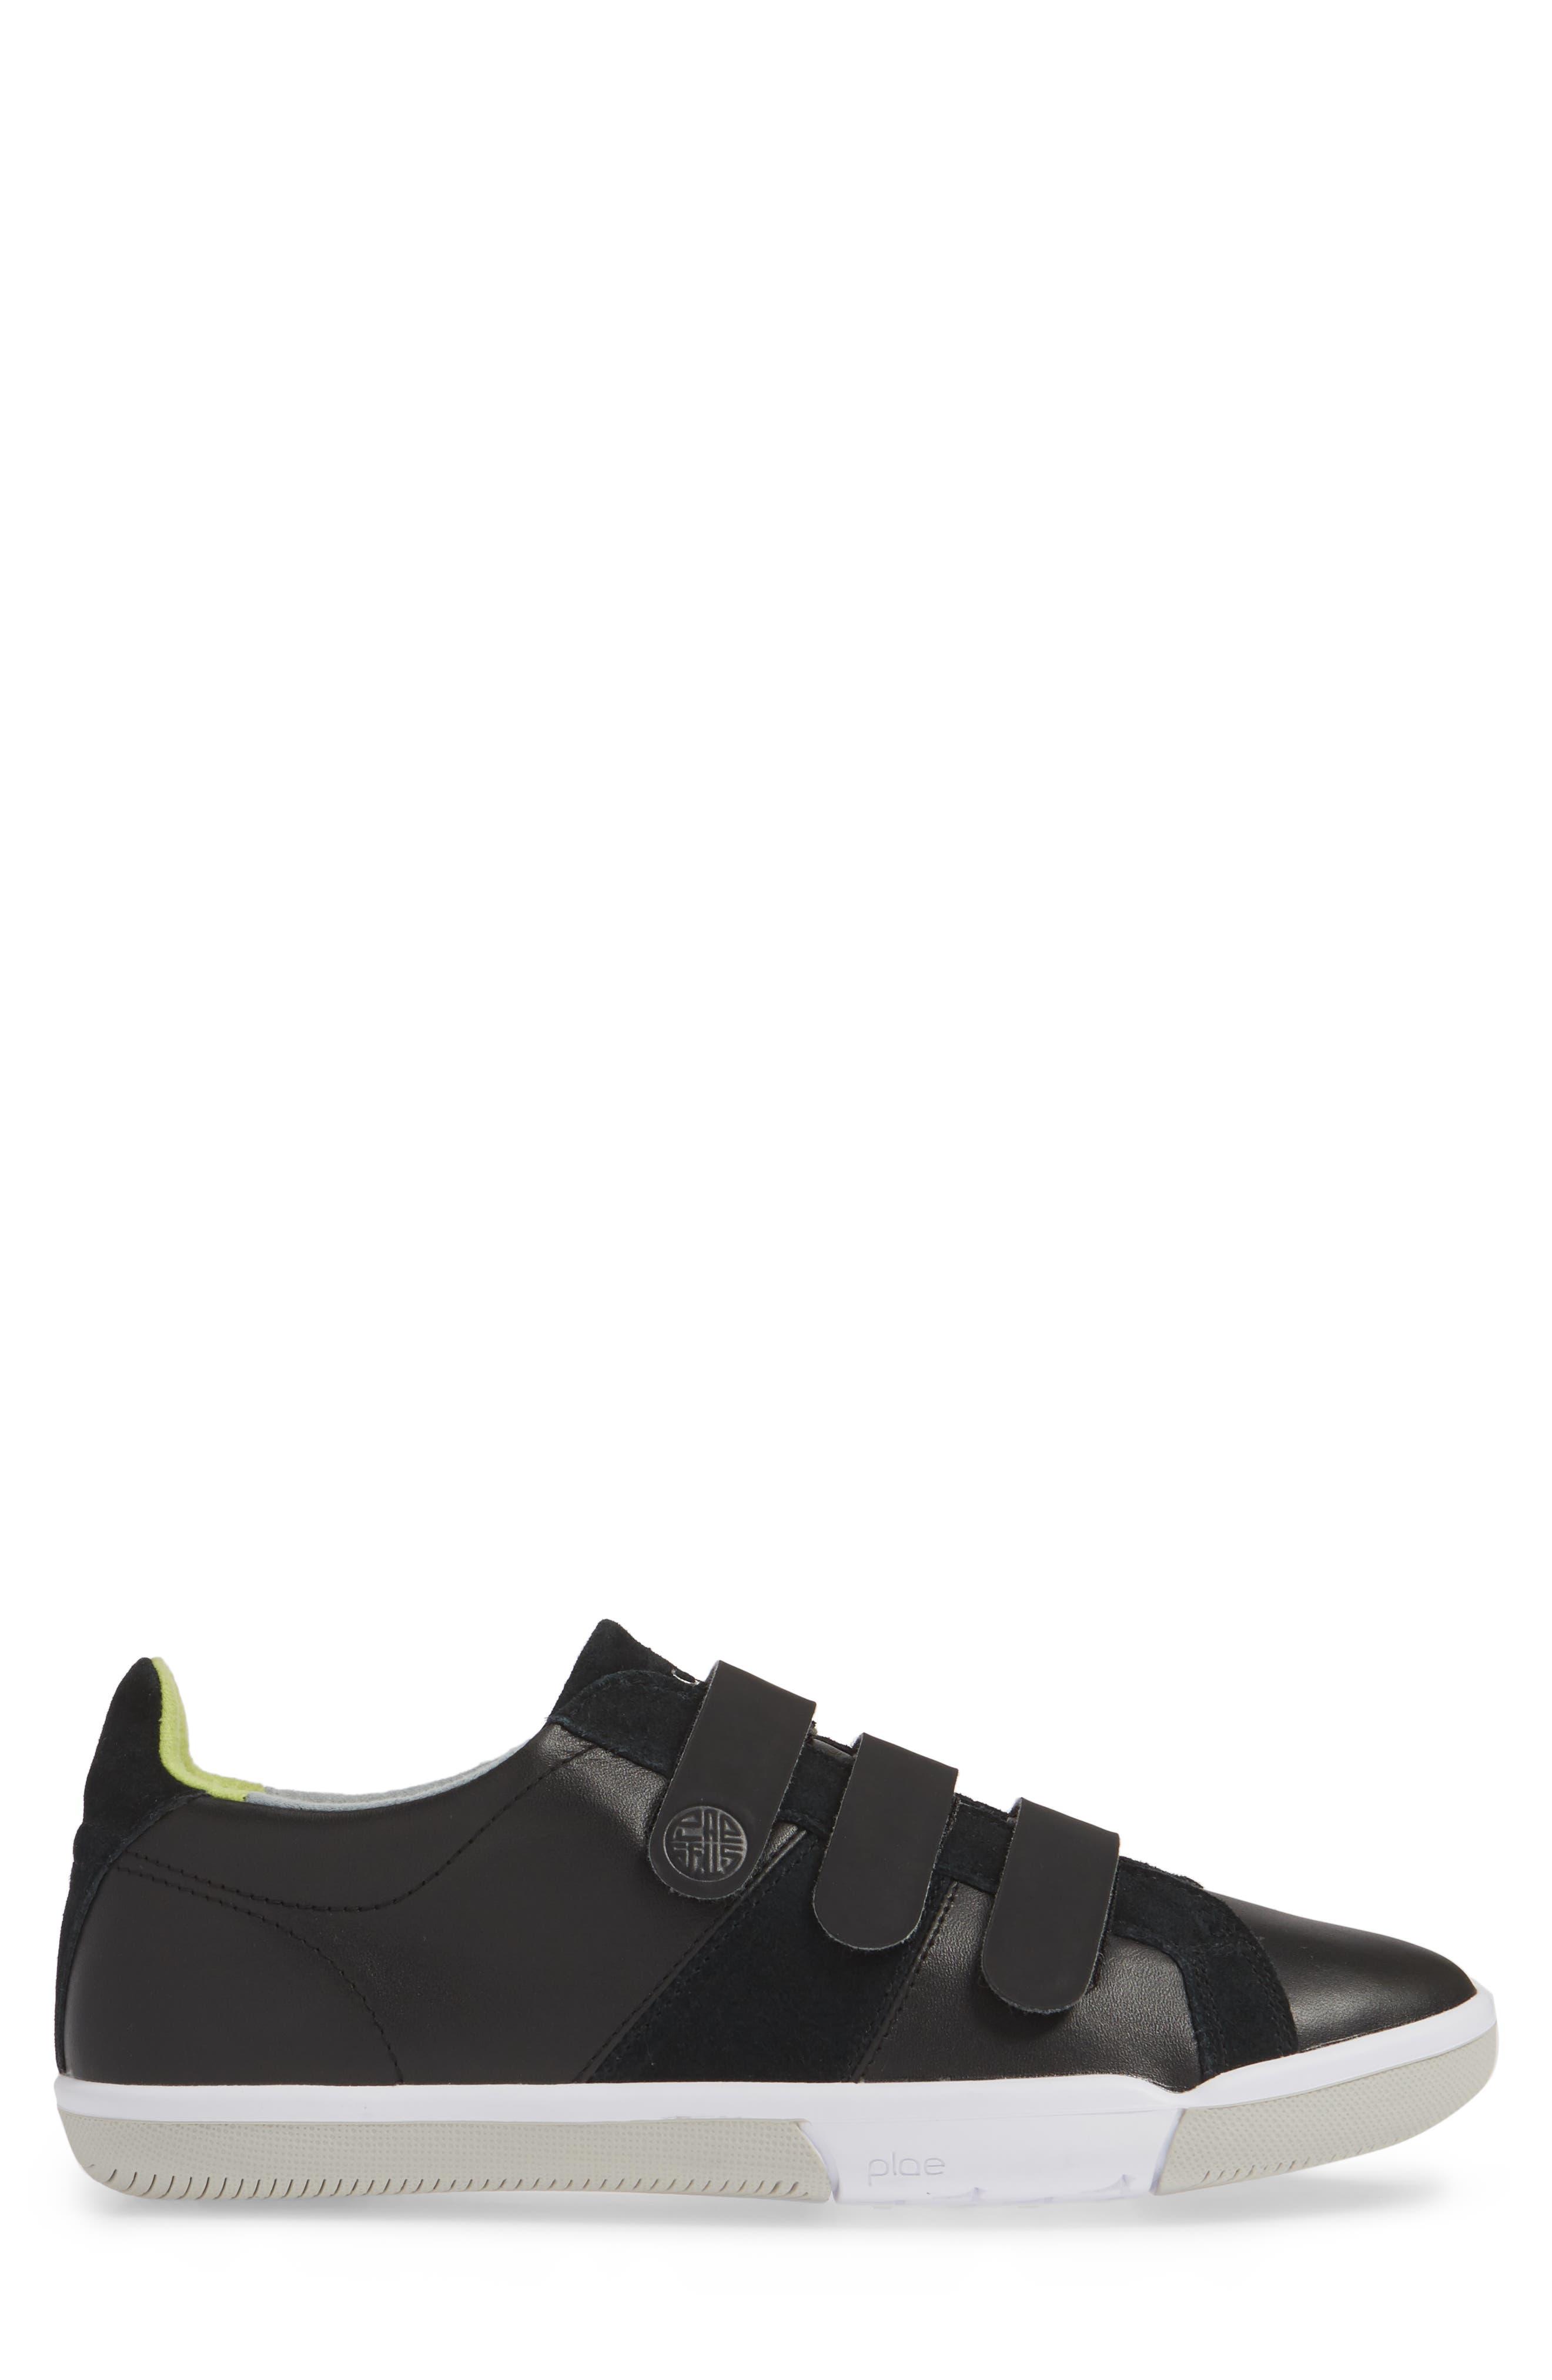 PLAE,                             Larkin Low Top Sneaker,                             Alternate thumbnail 3, color,                             BLACK LEATHER/ SUEDE